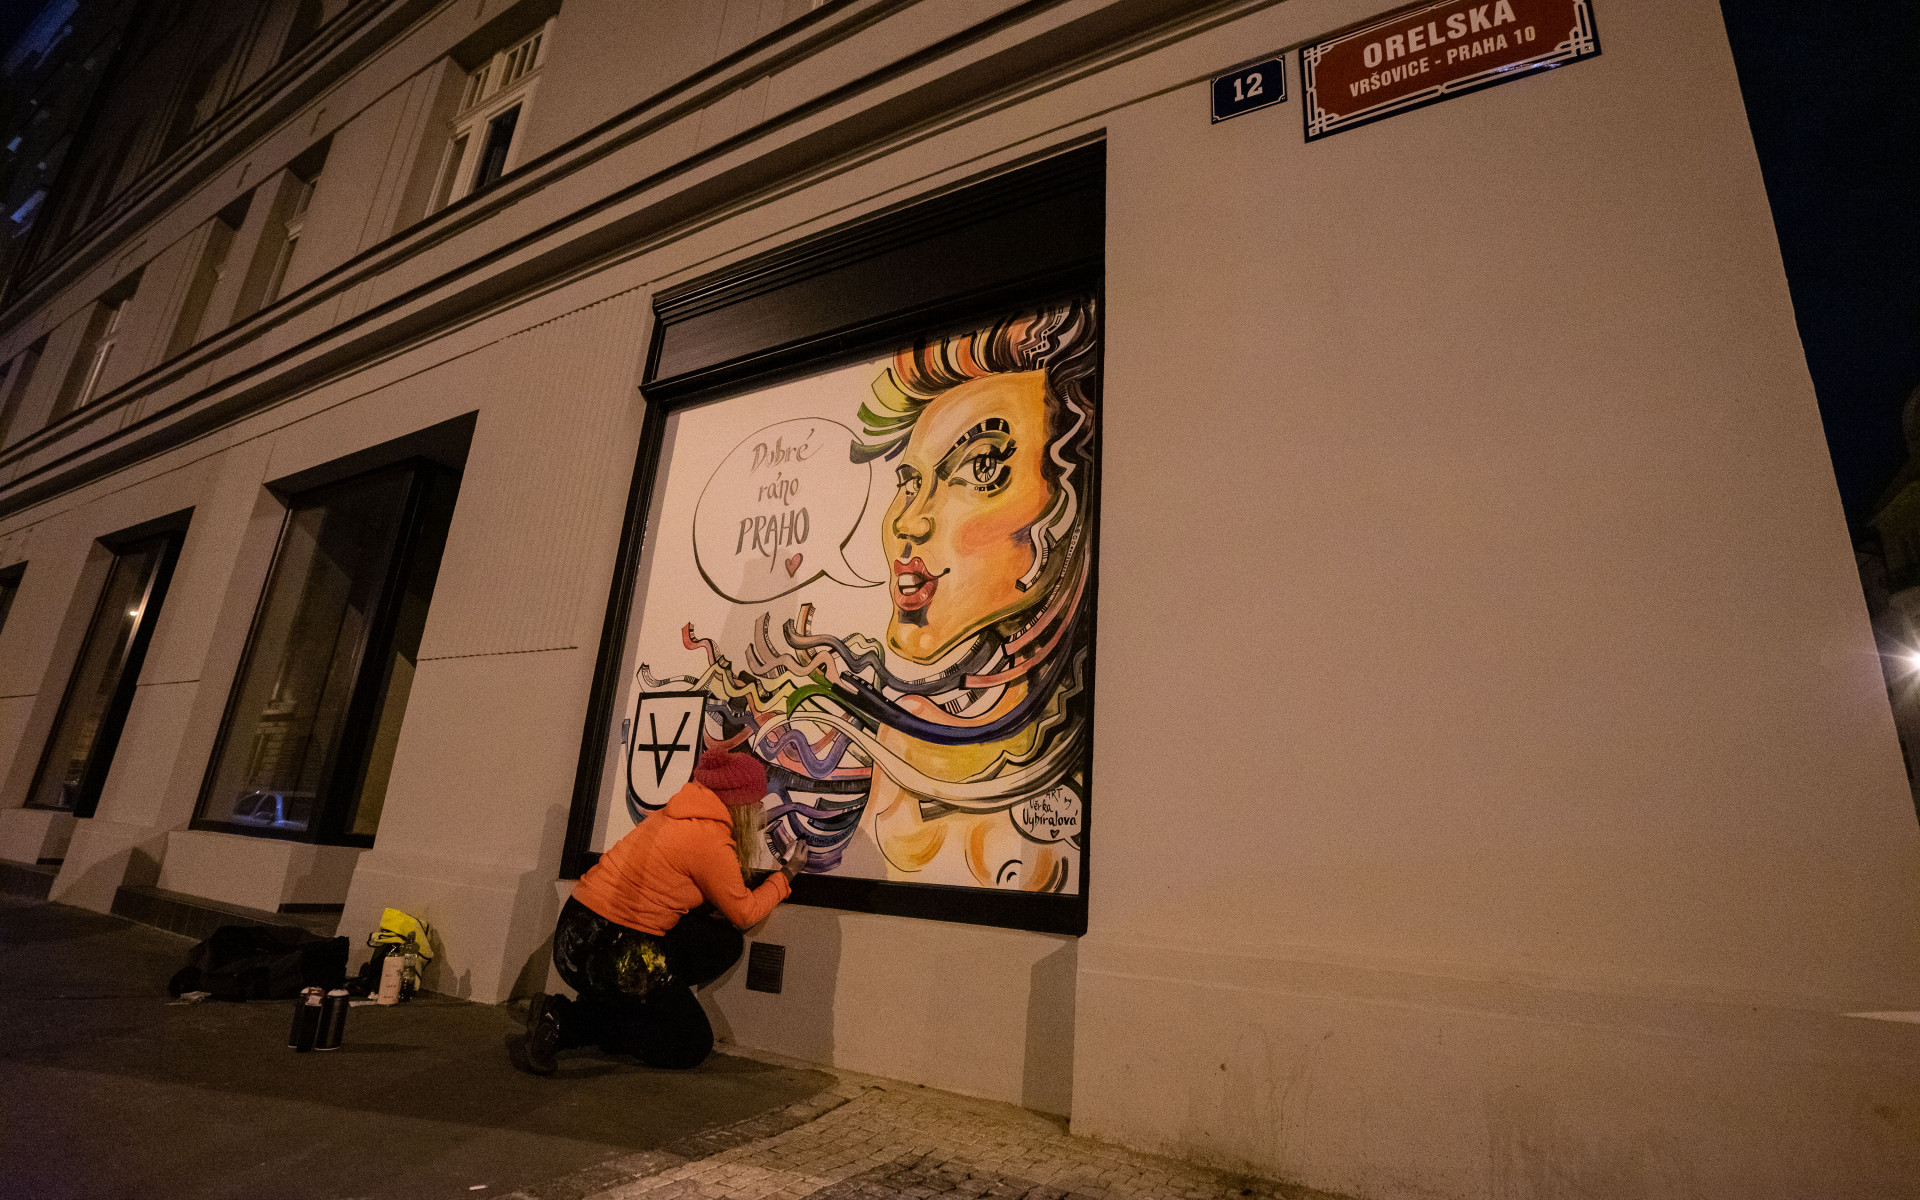 Исторический центр Праги разрисовали граффити.Вокруг Света. Украина